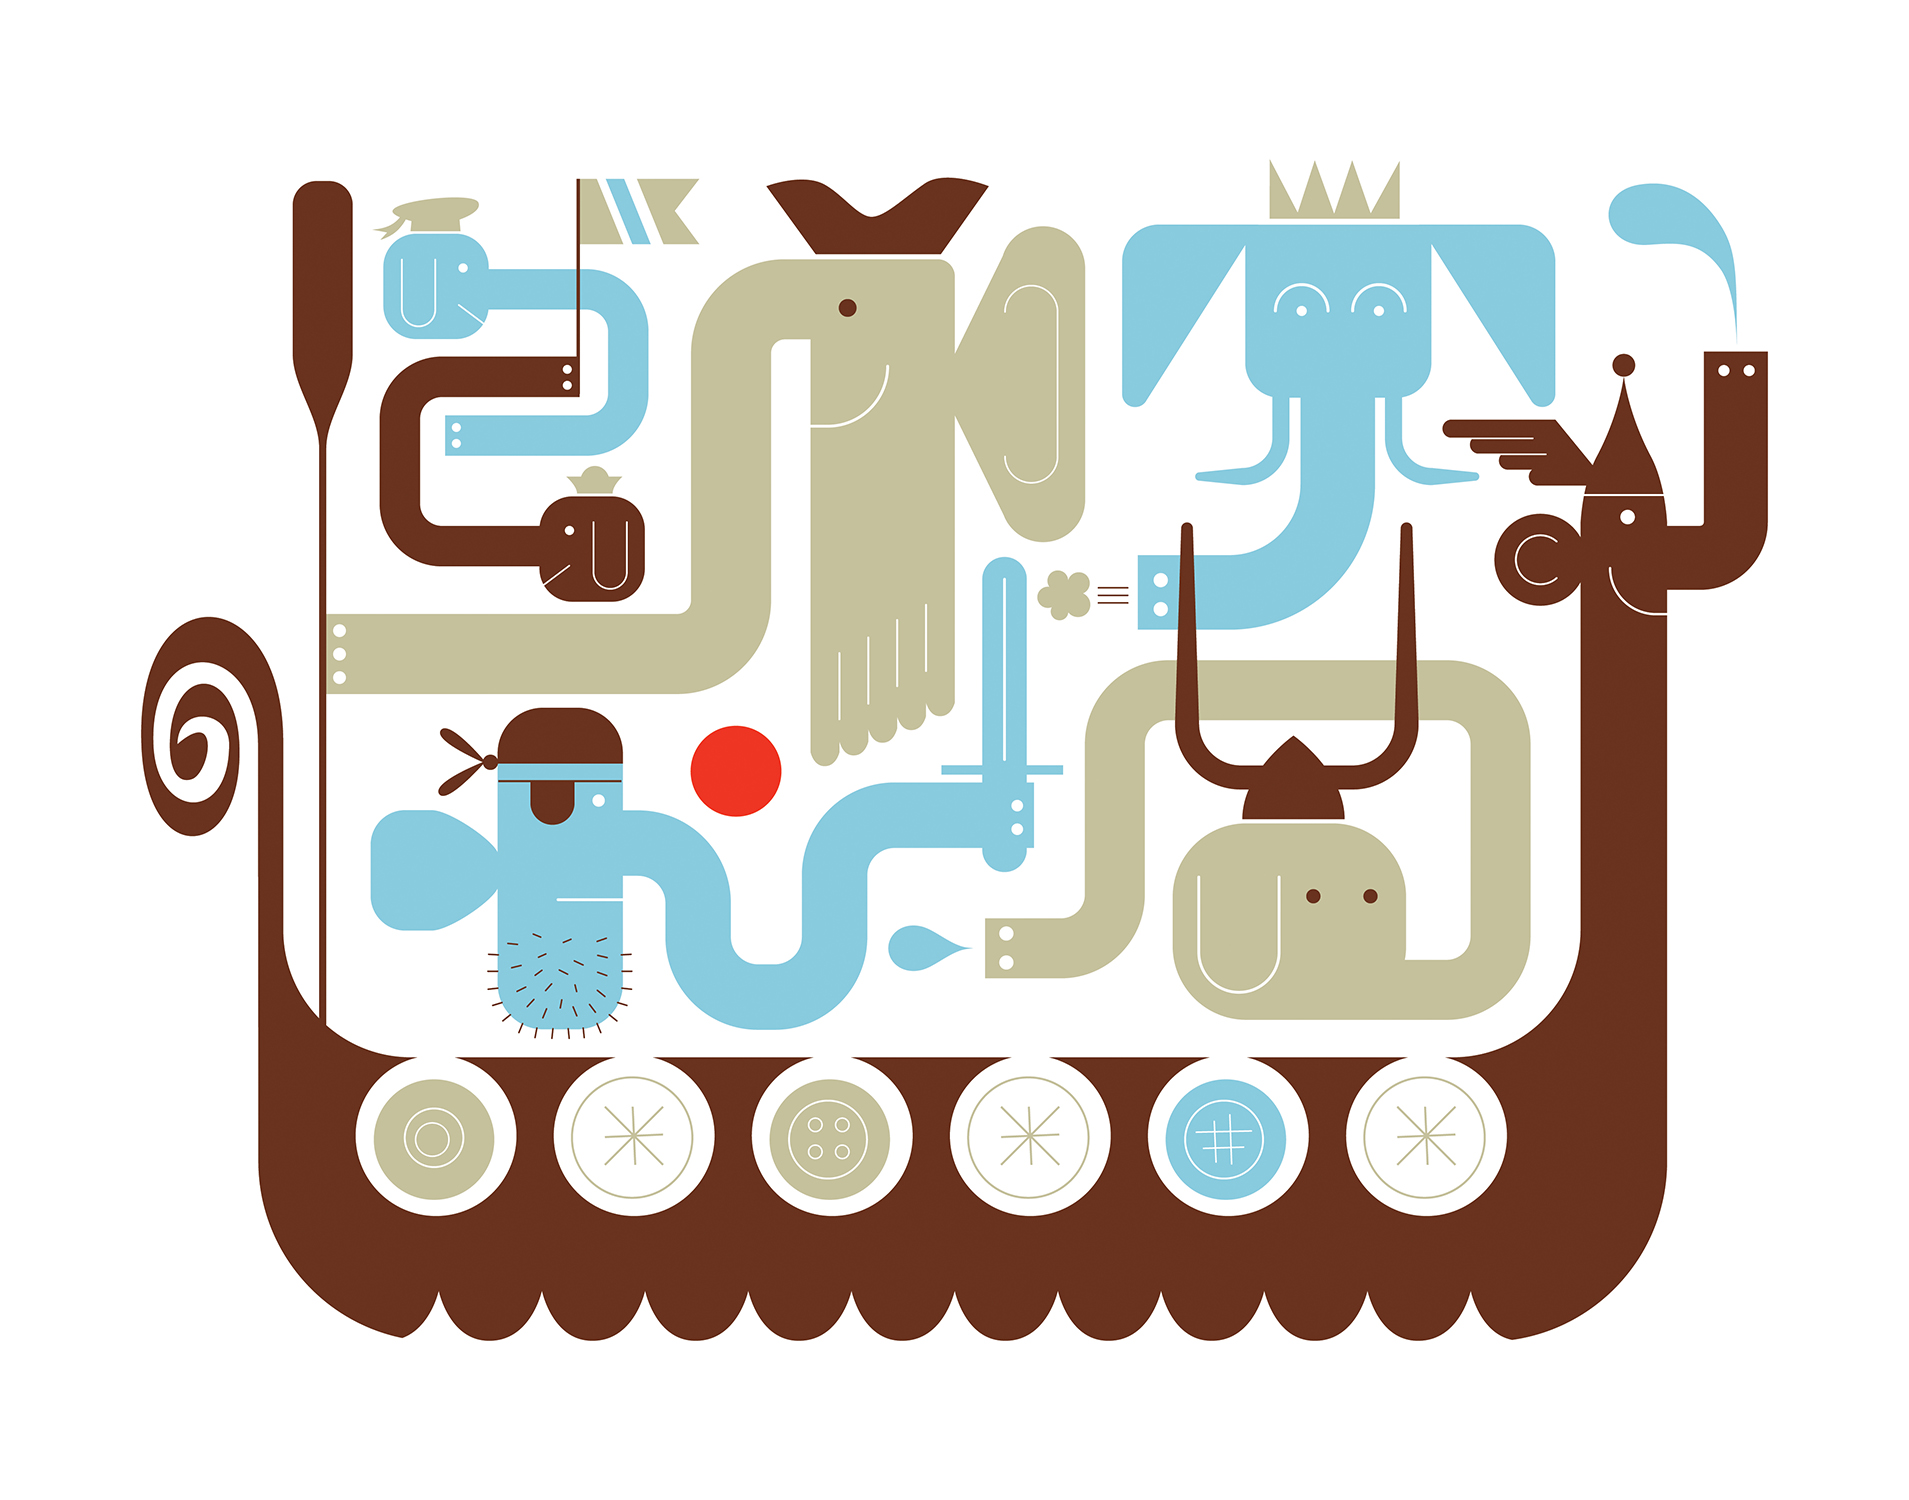 'Tuskers Ahoy' by Michael Bartalos